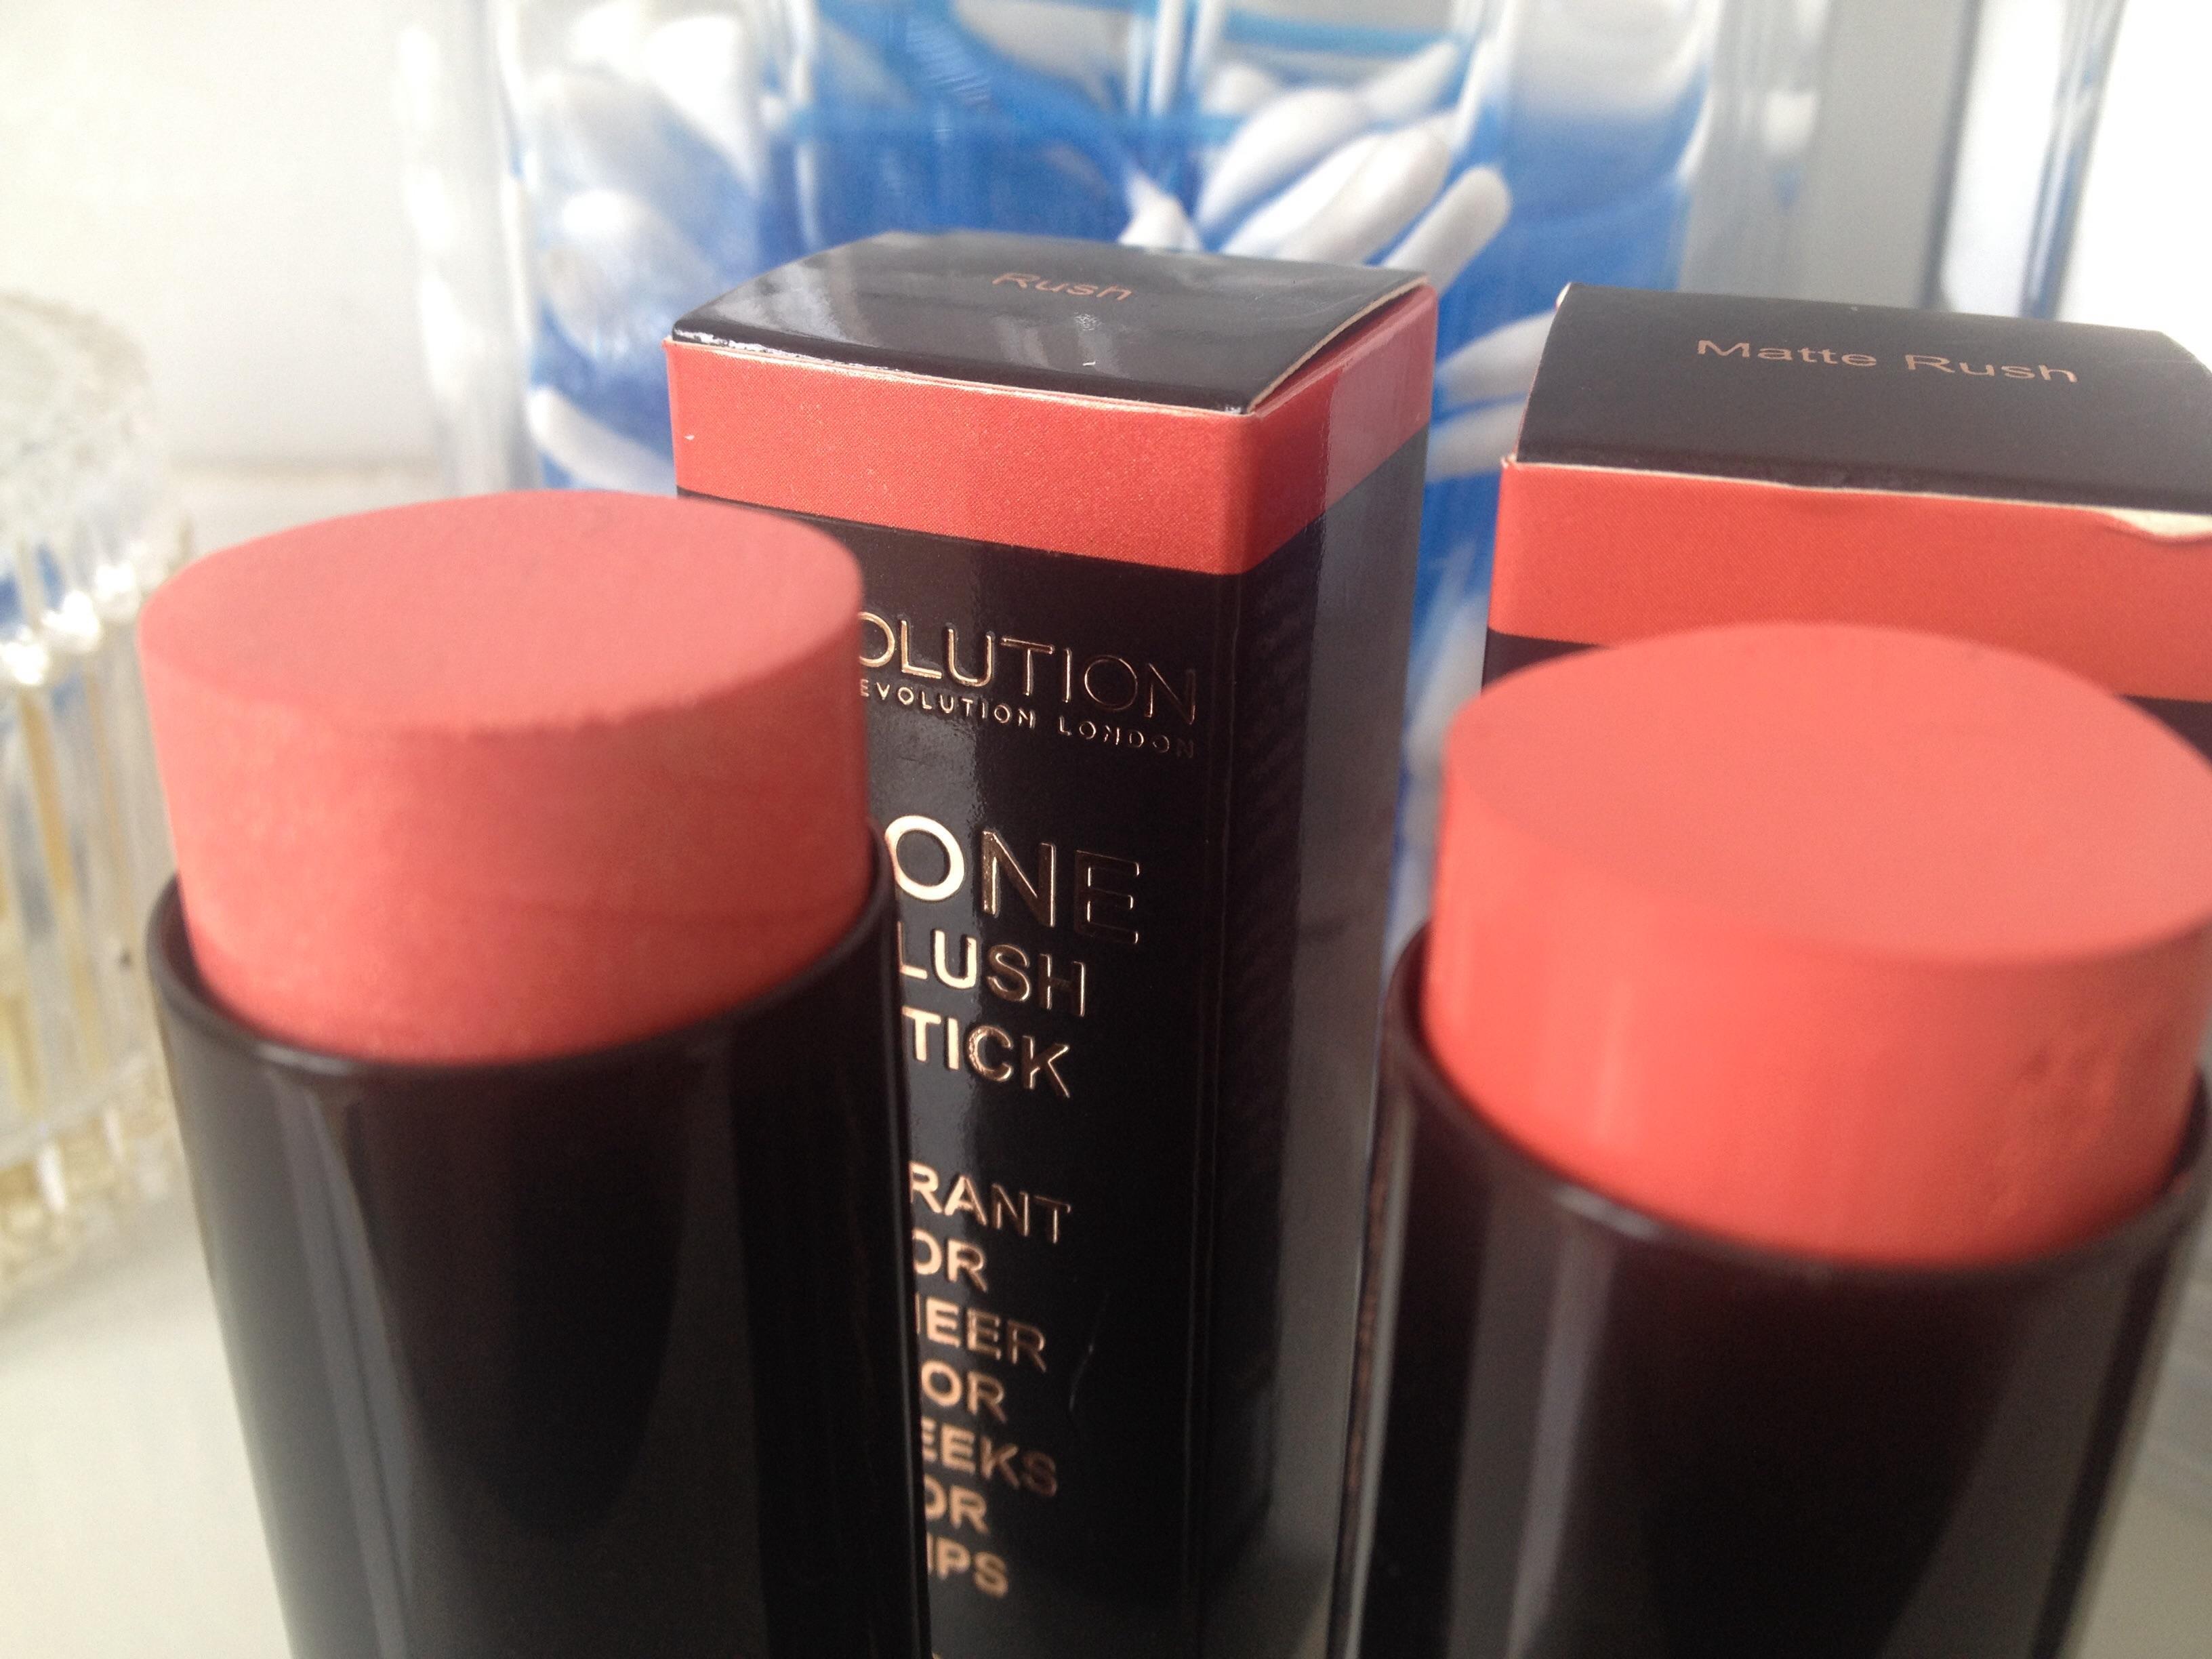 Make Up Revolution The One Blush Stick Nars Orgasm Dupe-8795